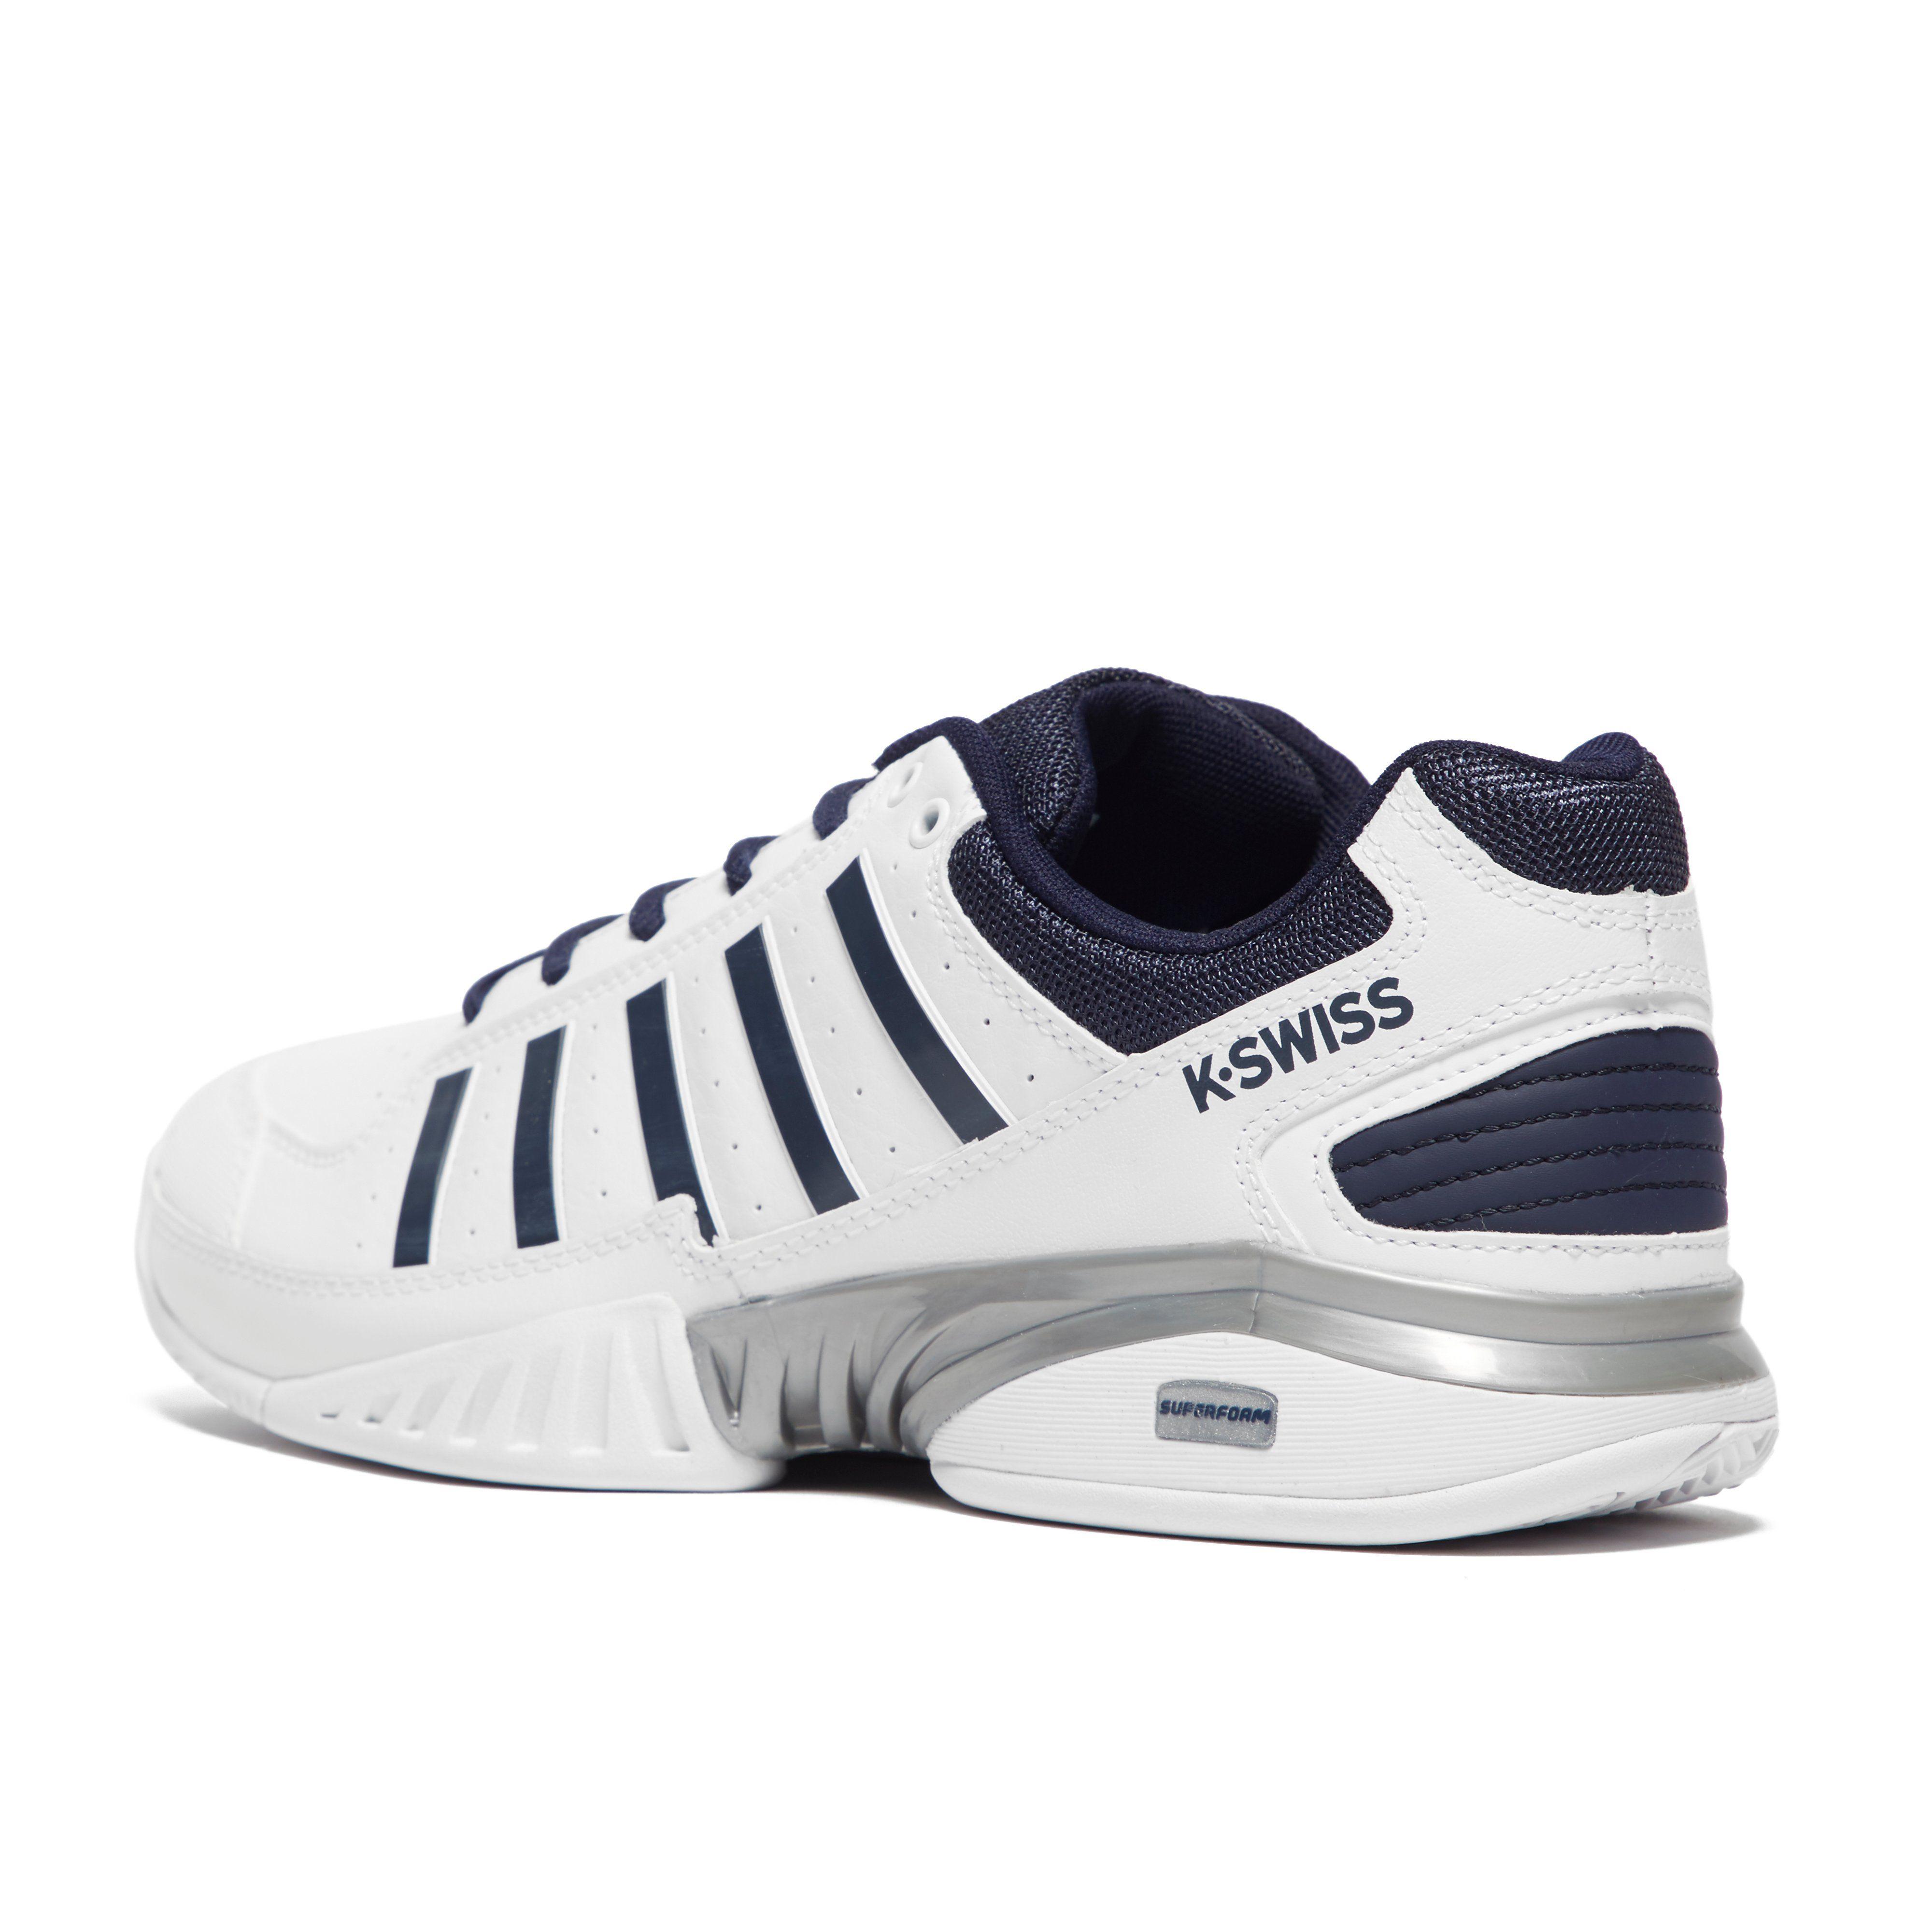 K-Swiss Receiver IV Men's Tennis Shoes